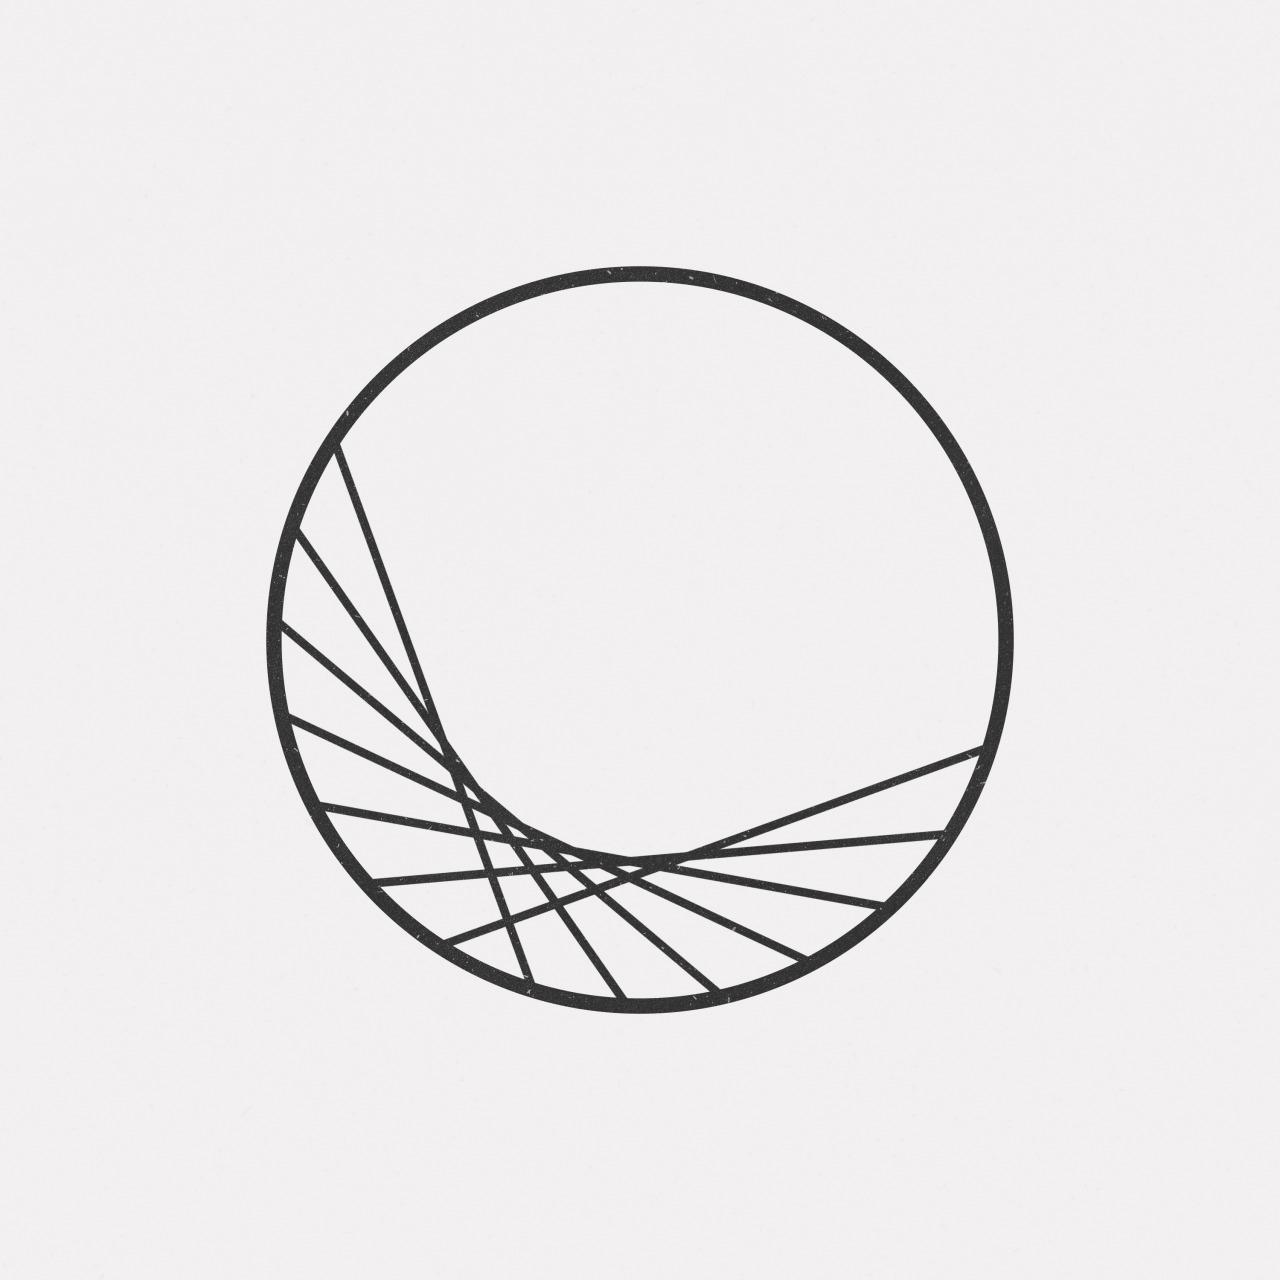 DAILY MINIMAL — #AU16-676 A new geometric design every day